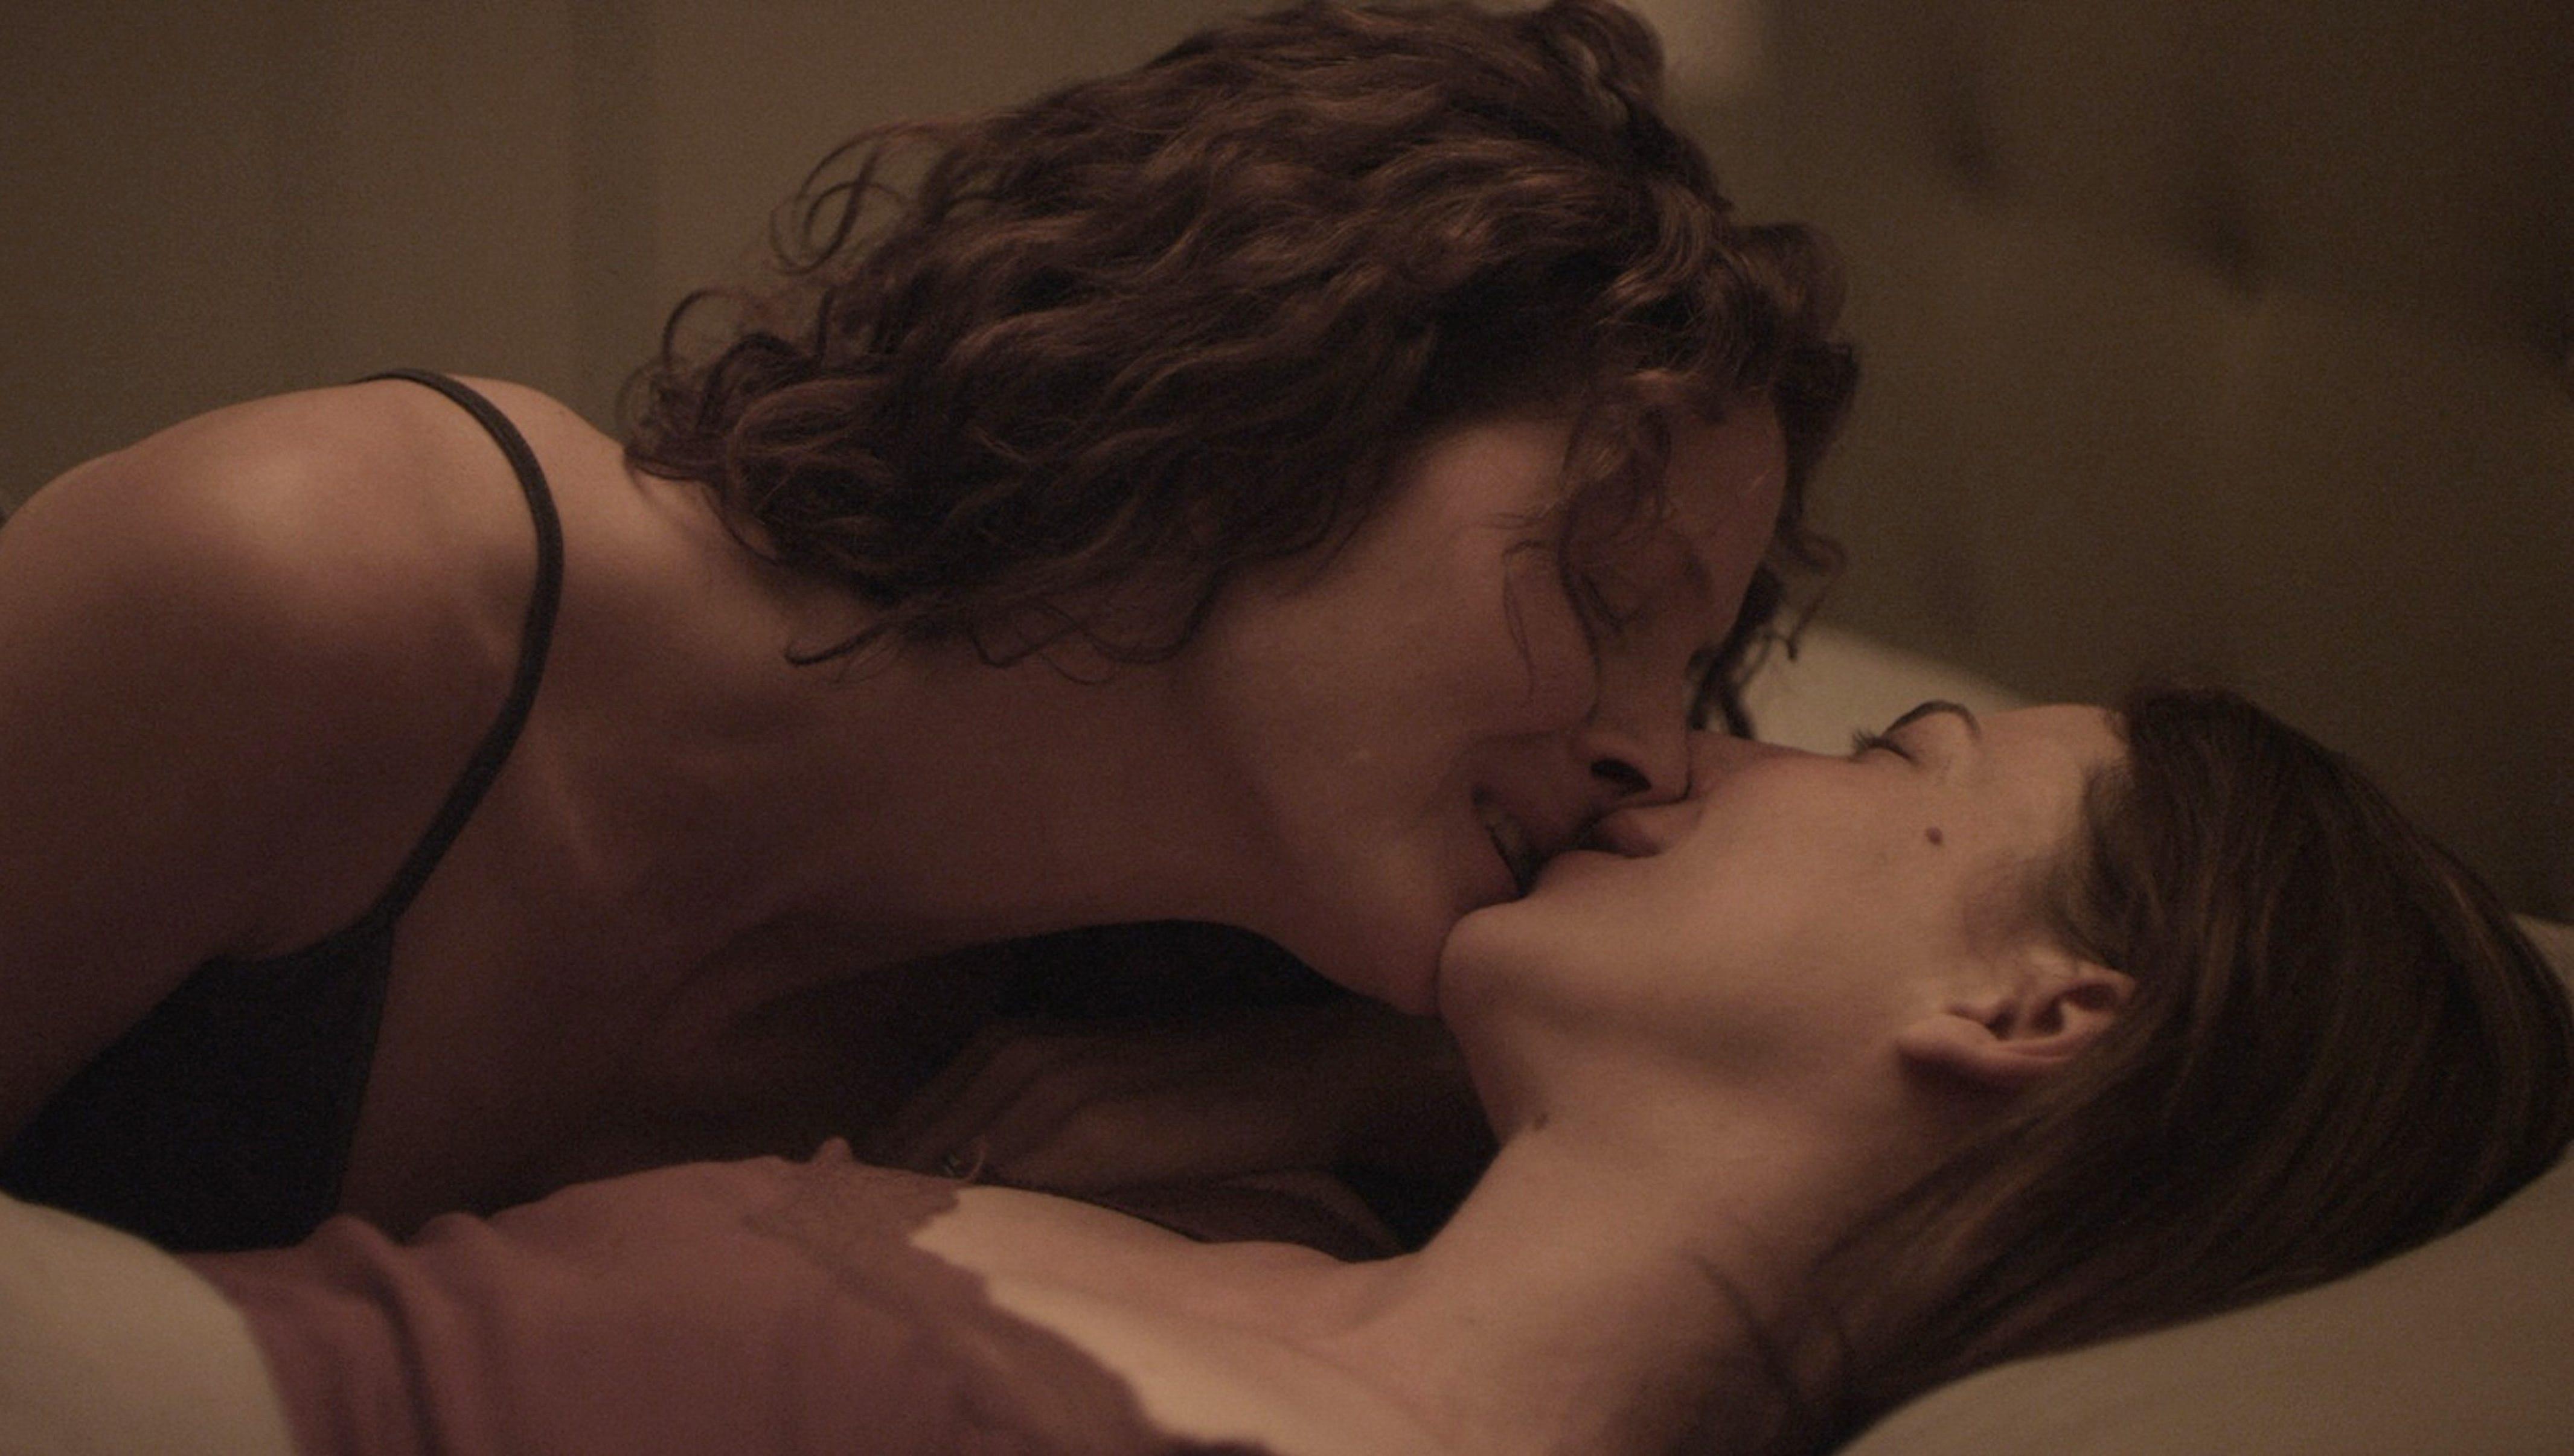 Romantic lesbian scene